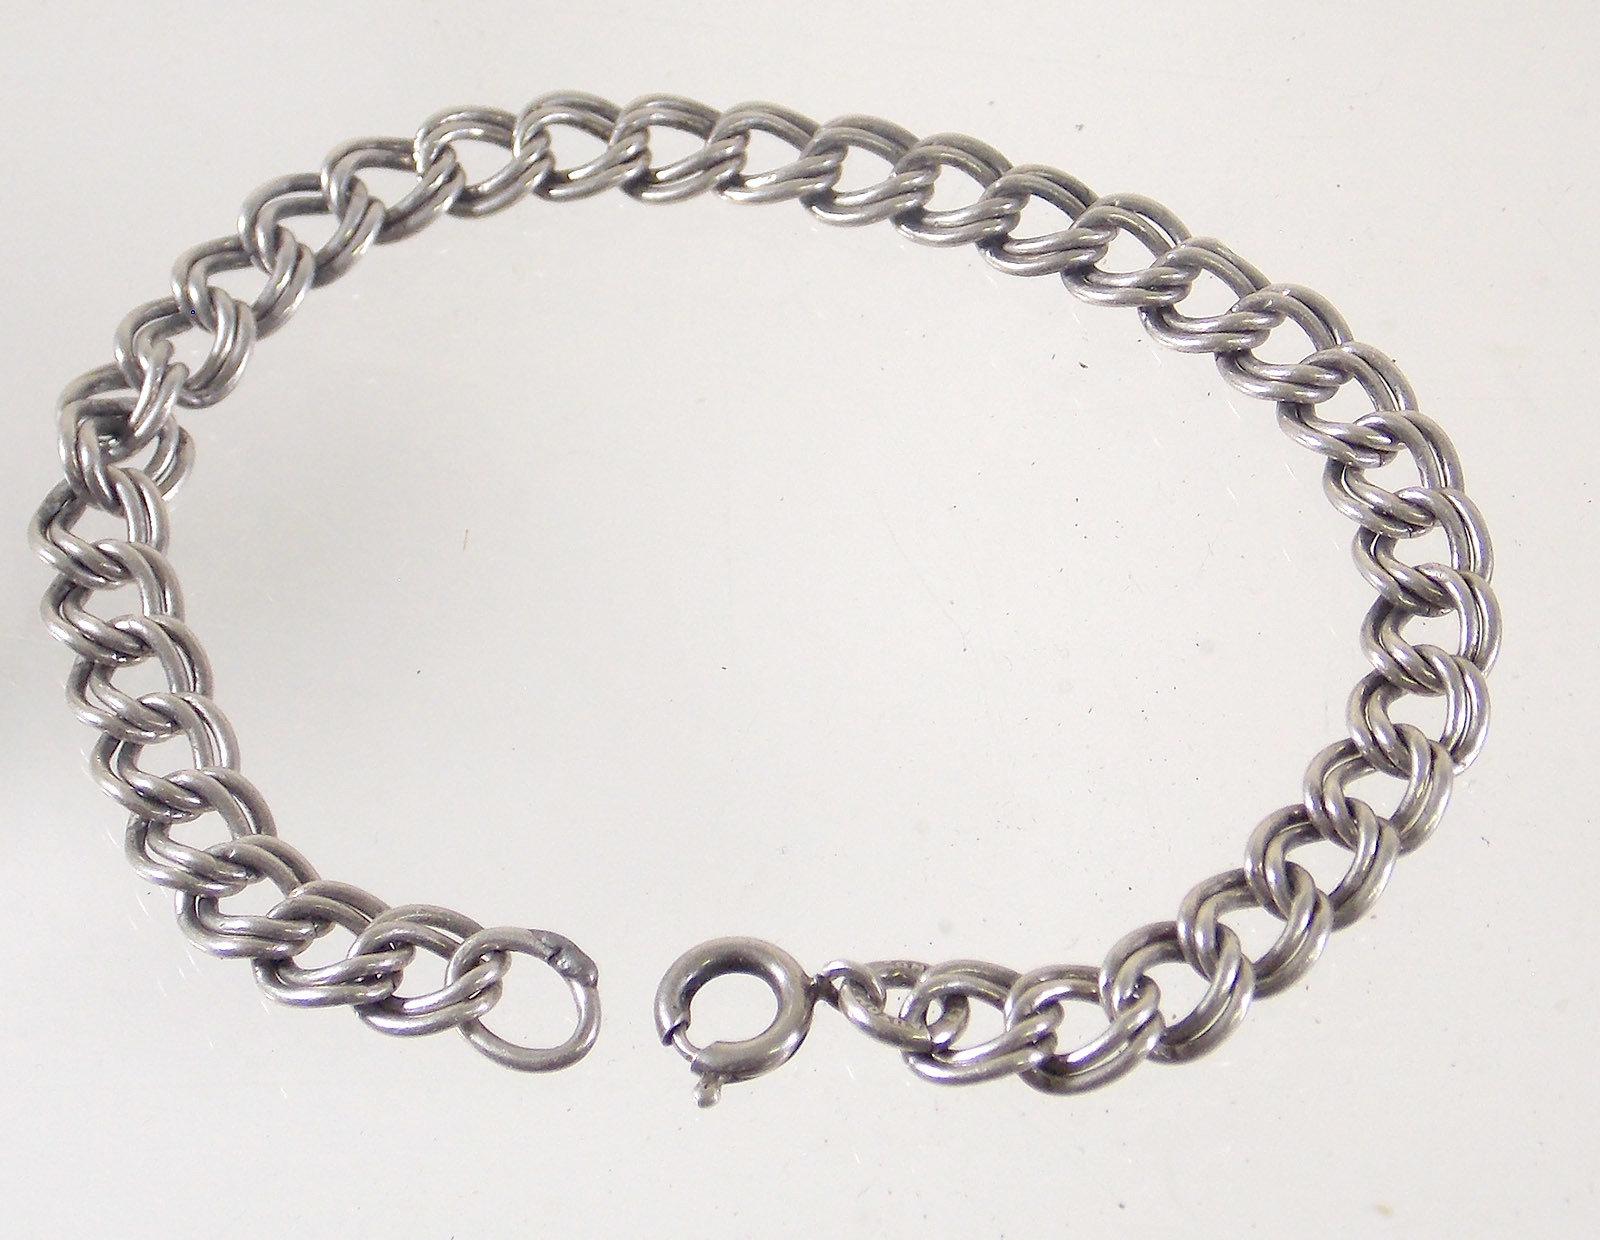 Sterling Silver Charm Bracelet 00022